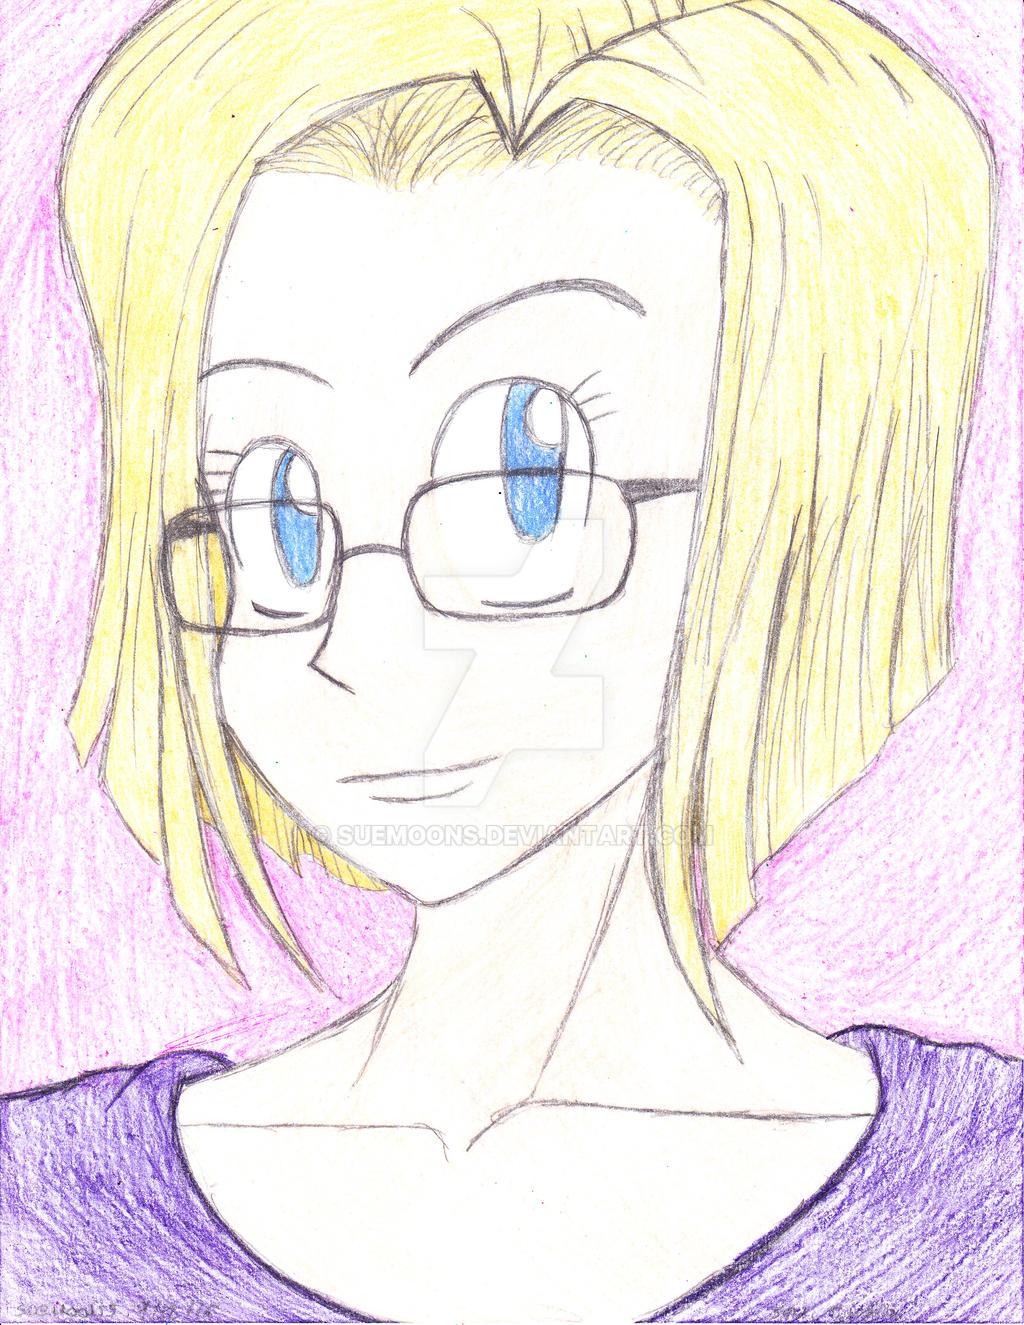 Suemoons's Profile Picture